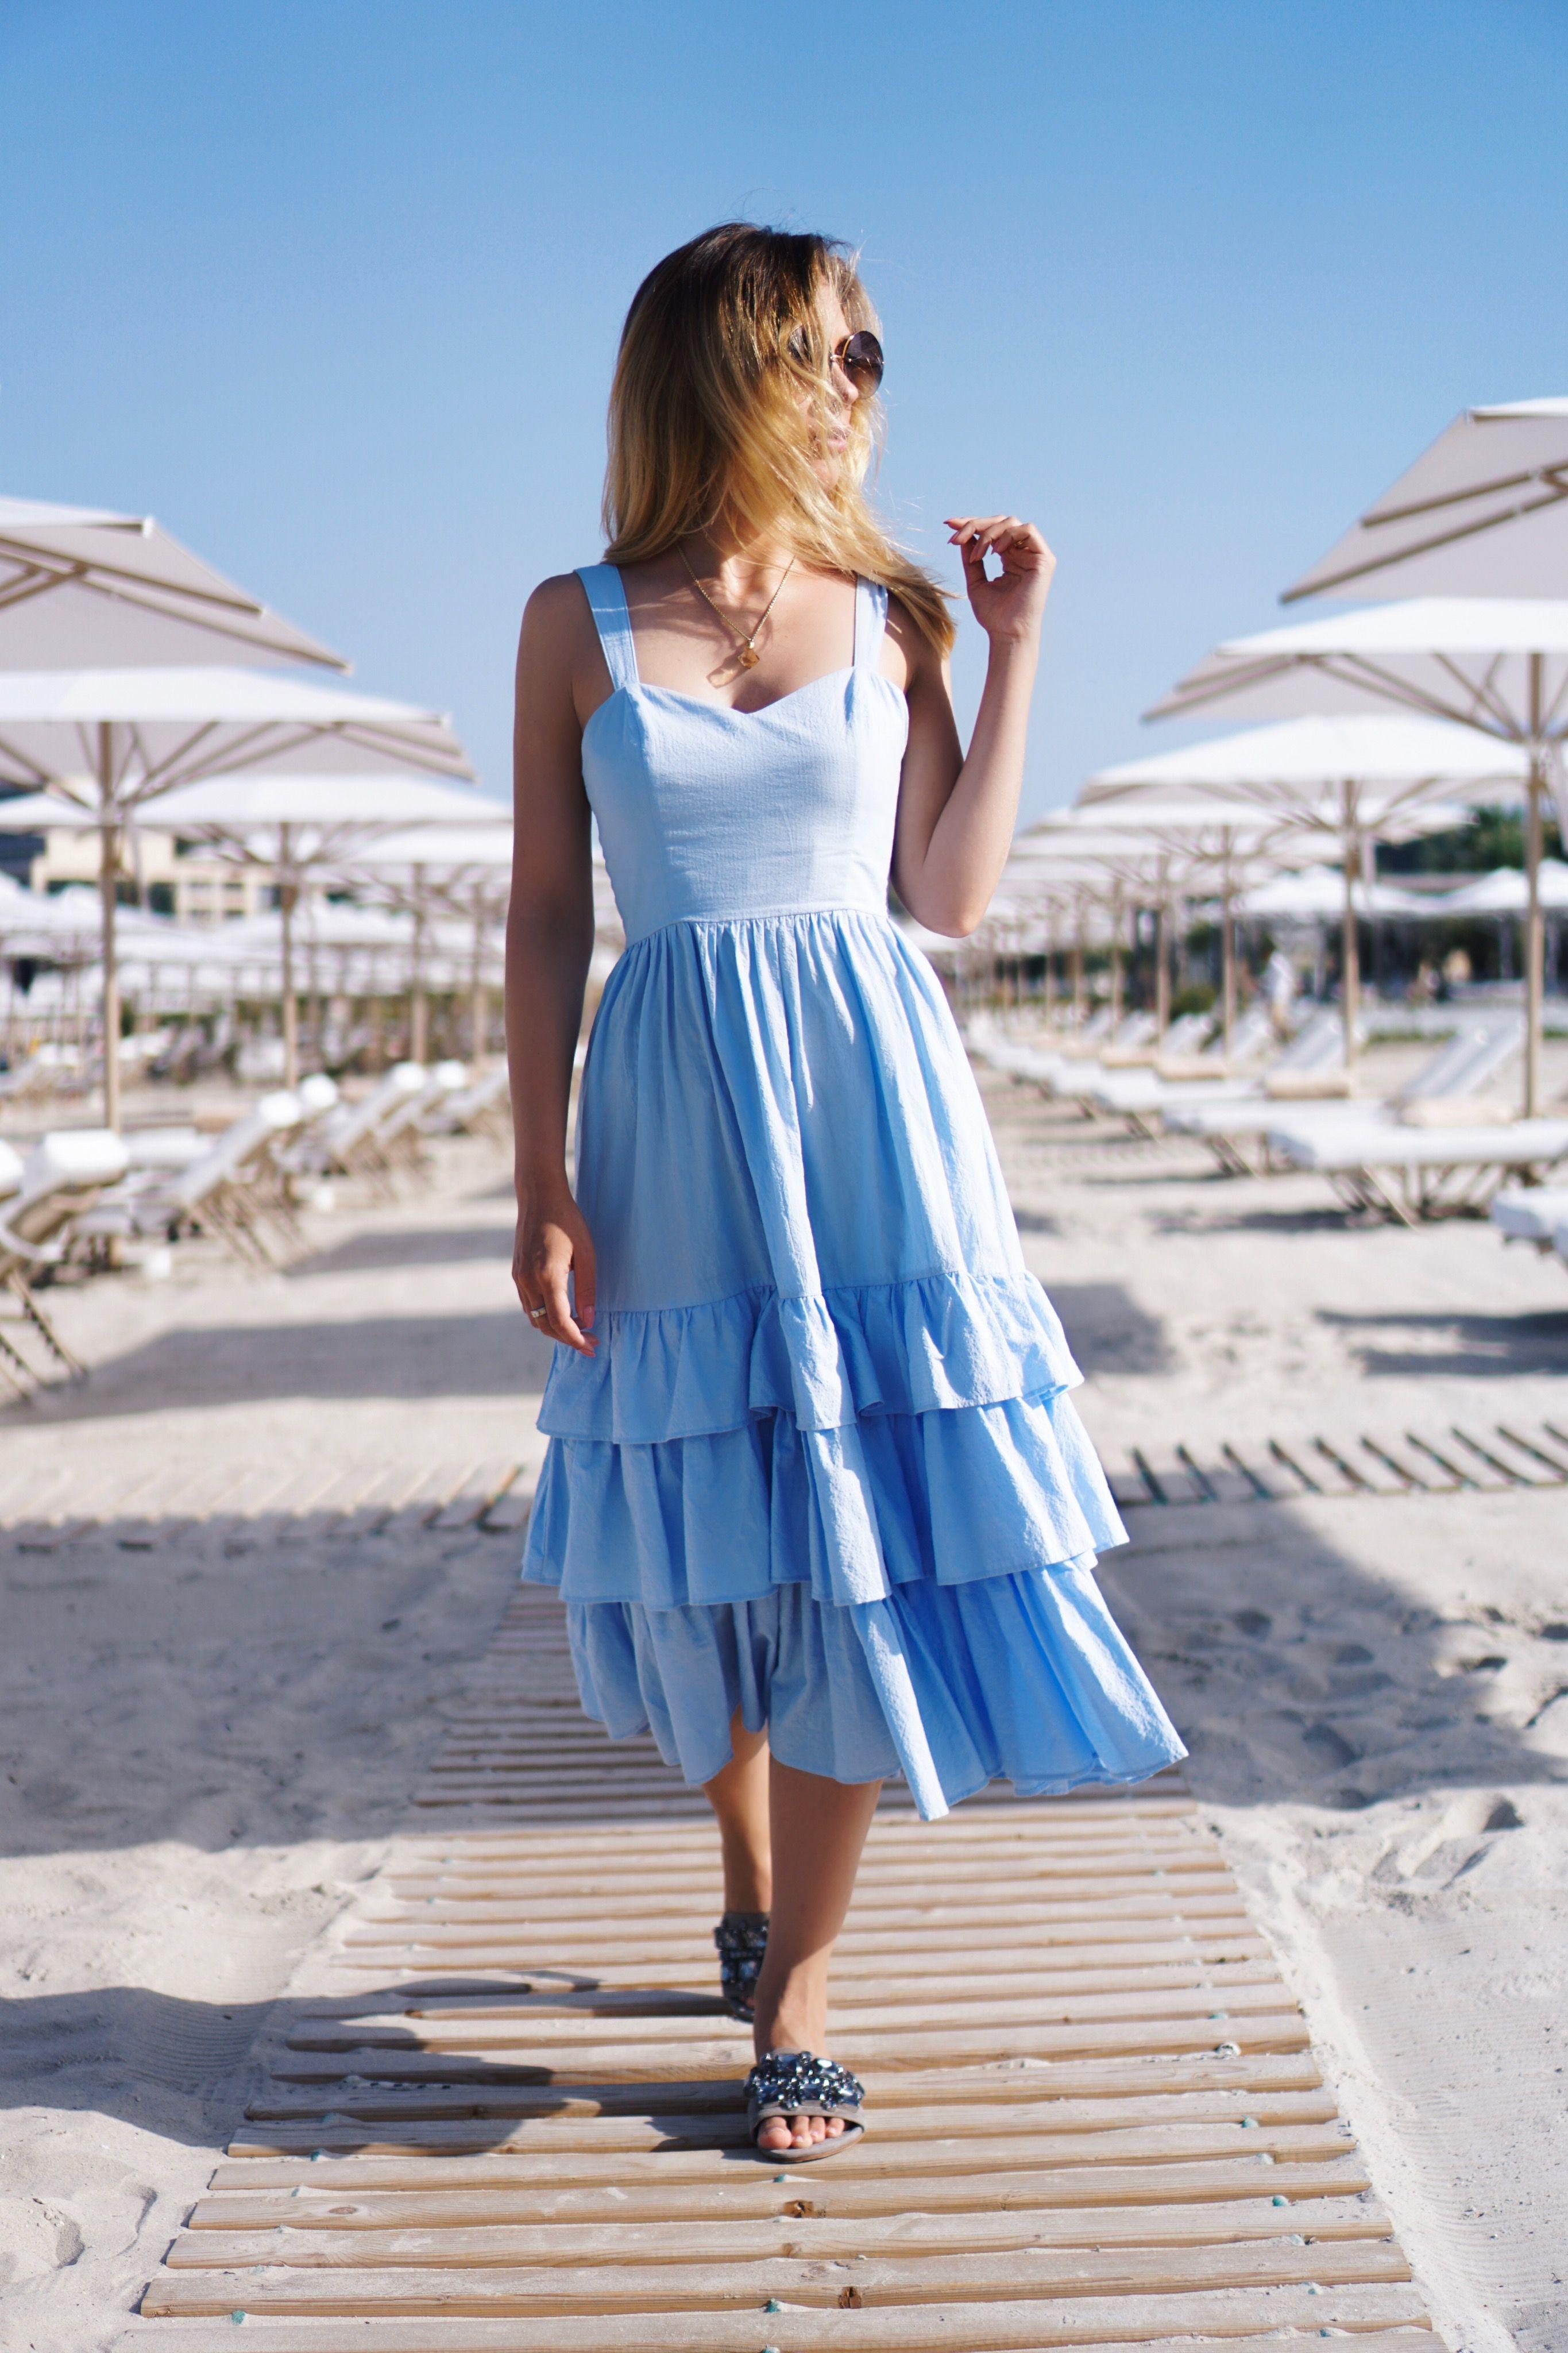 ea64806df4e OOTD - H&M Kleid www.louisa-maureen.com Fashion & beauty blog ...